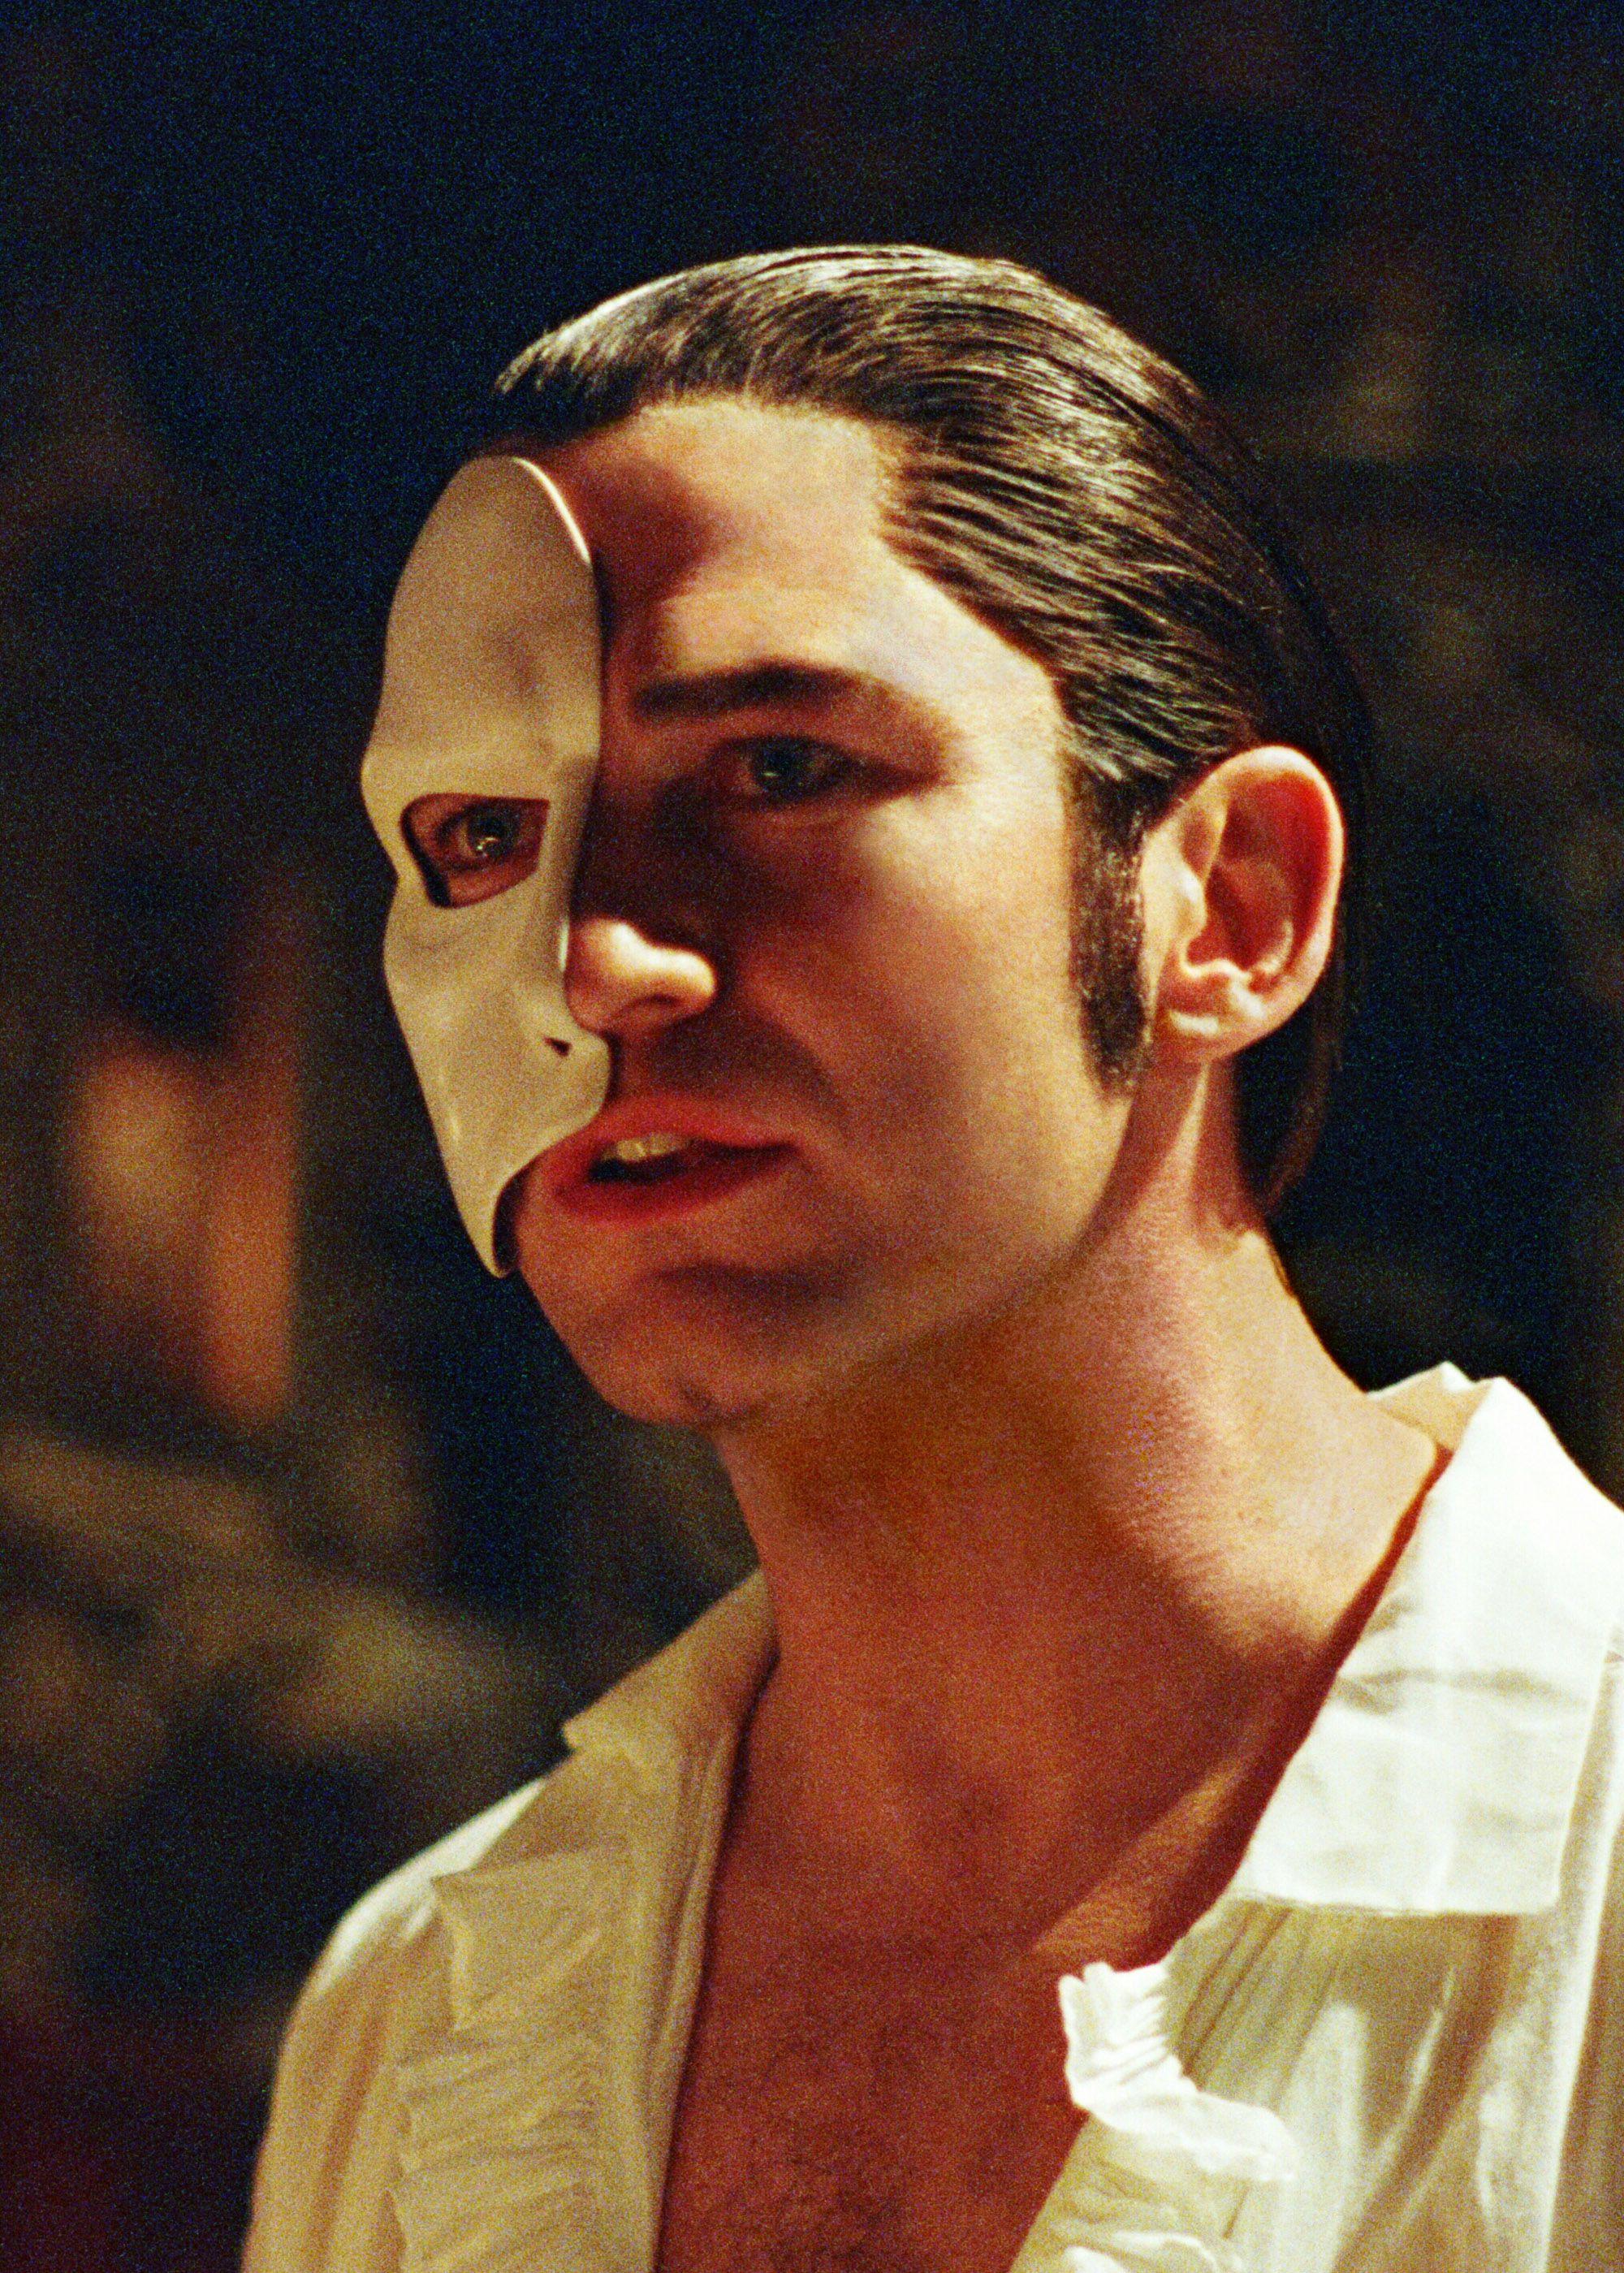 Gerard Butler As The Phantom 2004 The Phantom Of The Opera Directed By Joel Schumacher The Phan Phantom Of The Opera Music Of The Night Gerard Butler